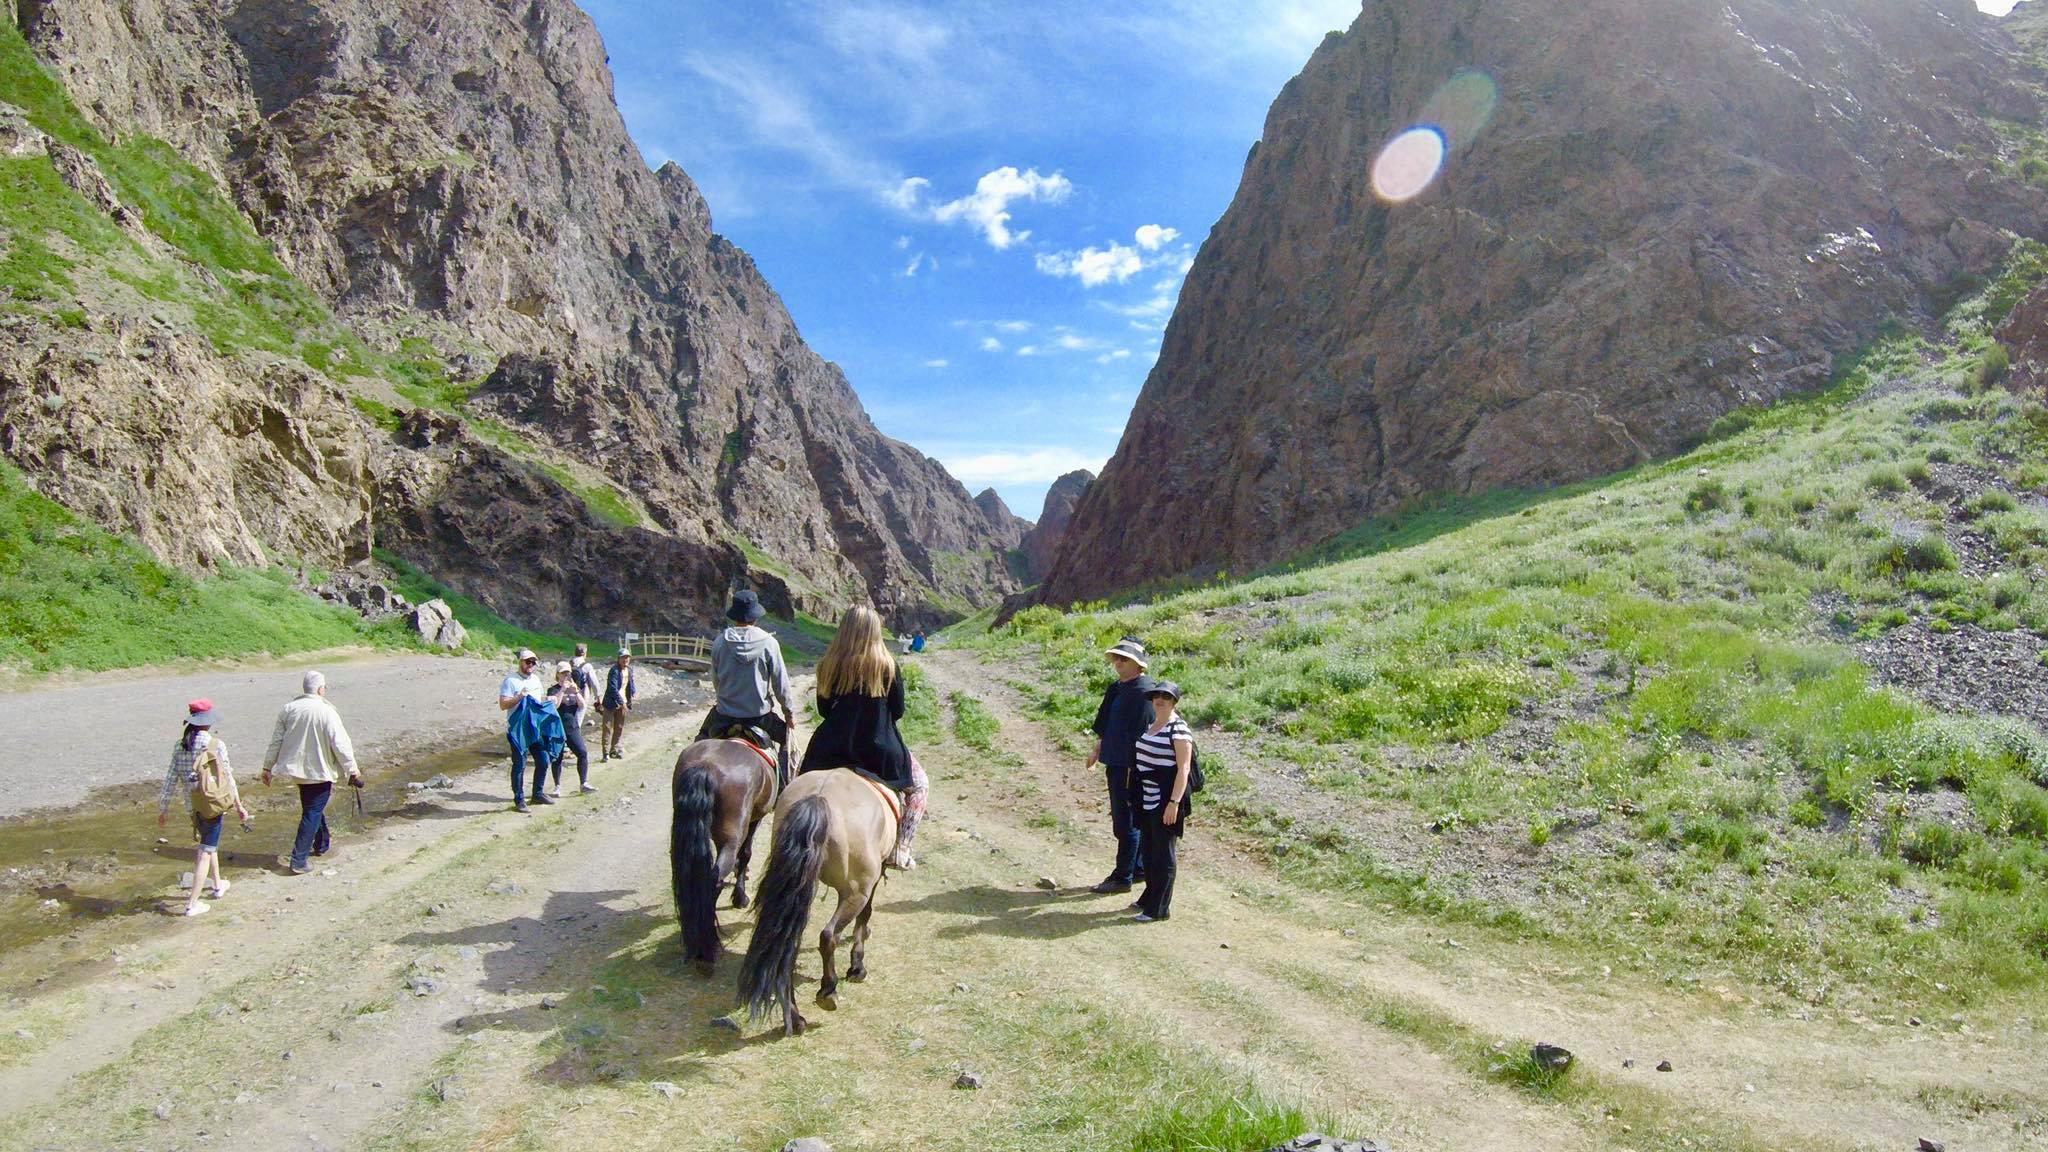 Kach Solo Travels in 2019 Horseback riding trip to the Gobi Gurvan Saikhan National Park9.jpg